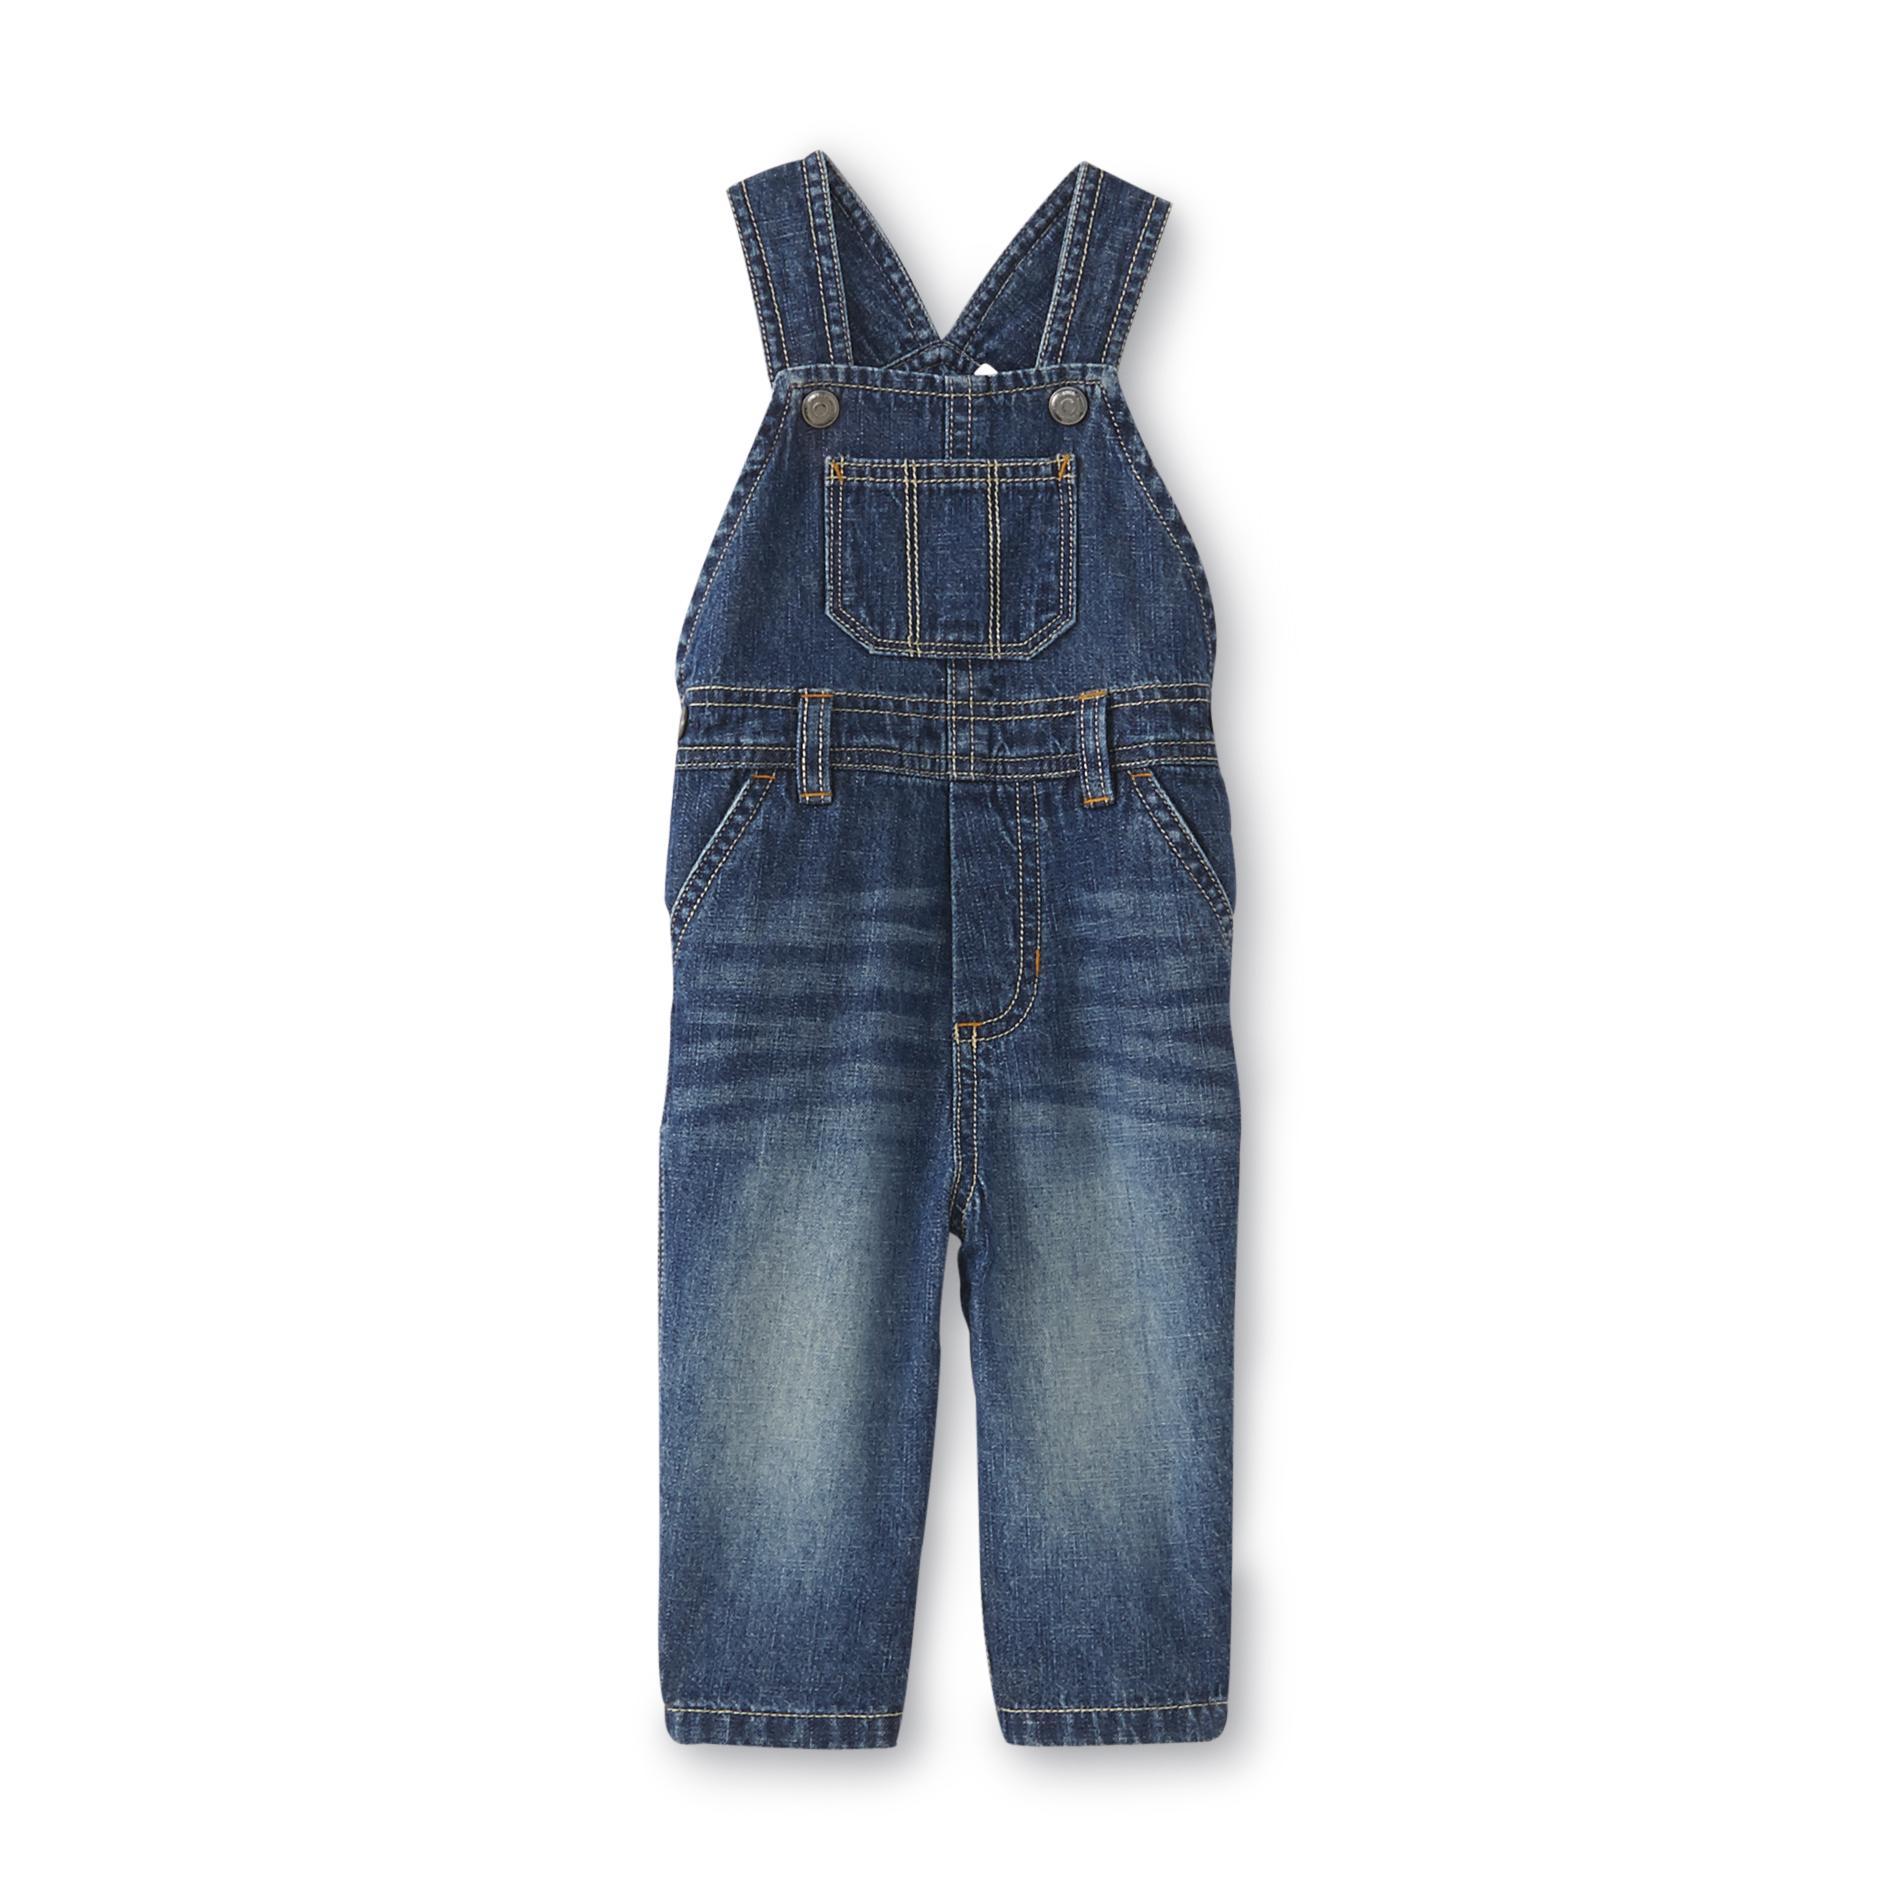 Little Wonders Newborn & Infant Boy's Denim Overalls